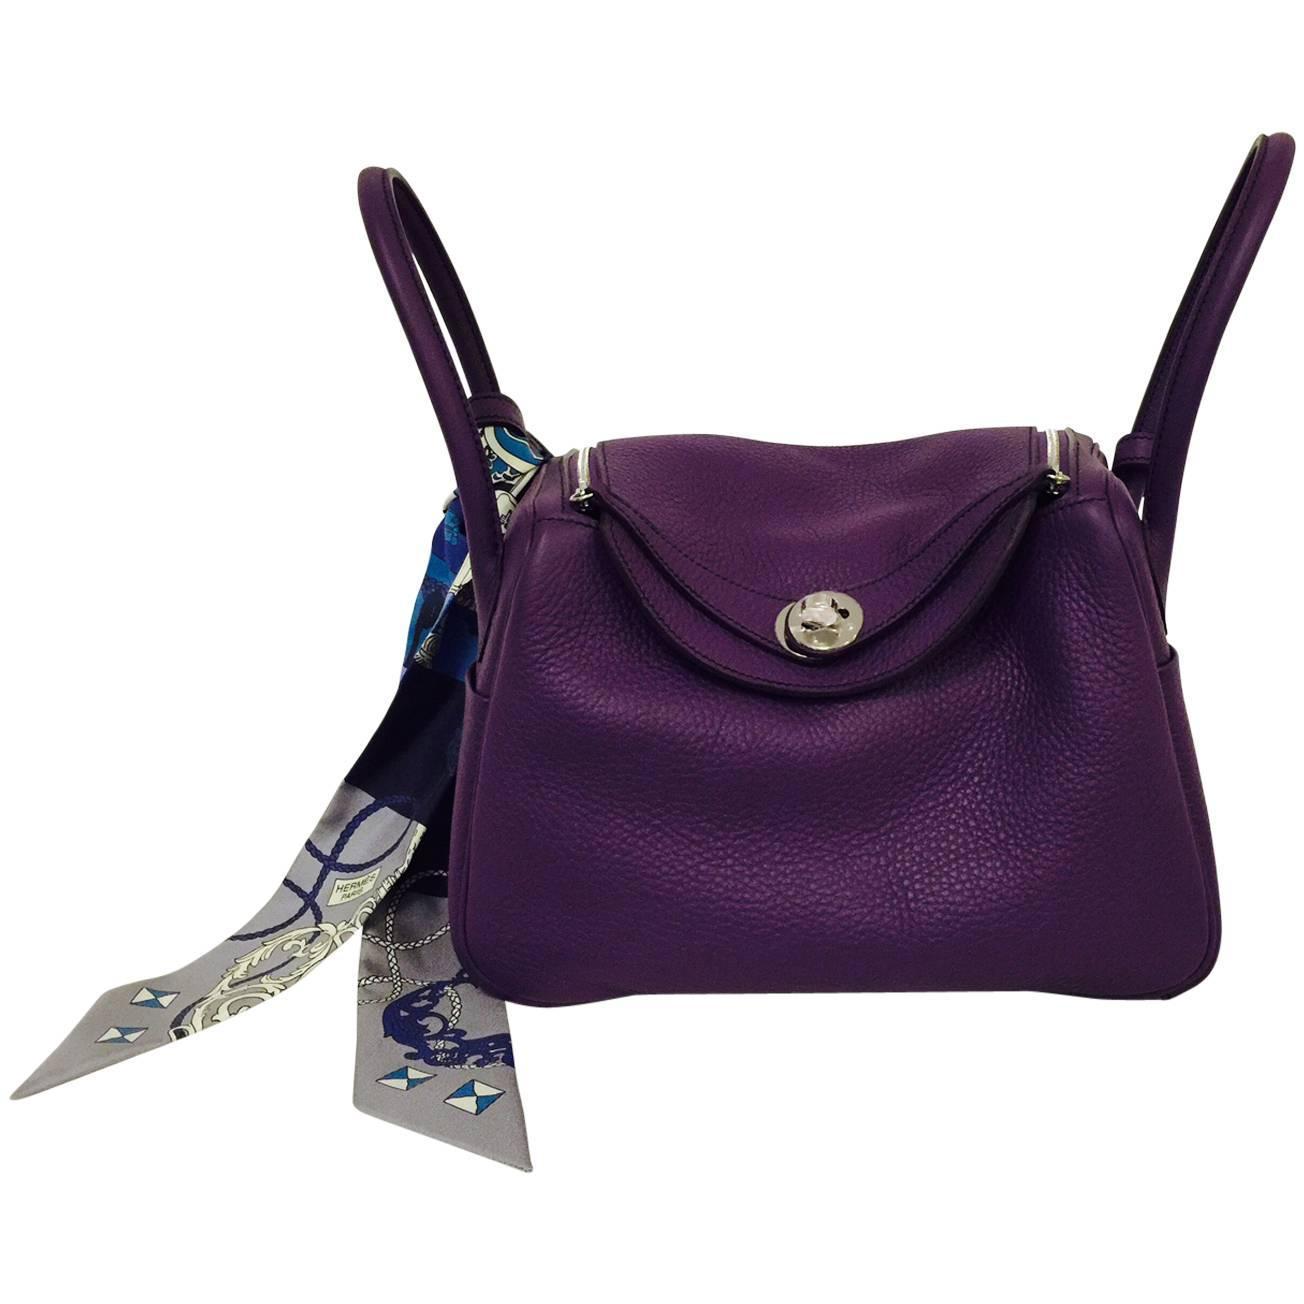 hermes messenger - Vintage Herm��s Handbags and Purses - 1,378 For Sale at 1stdibs ...